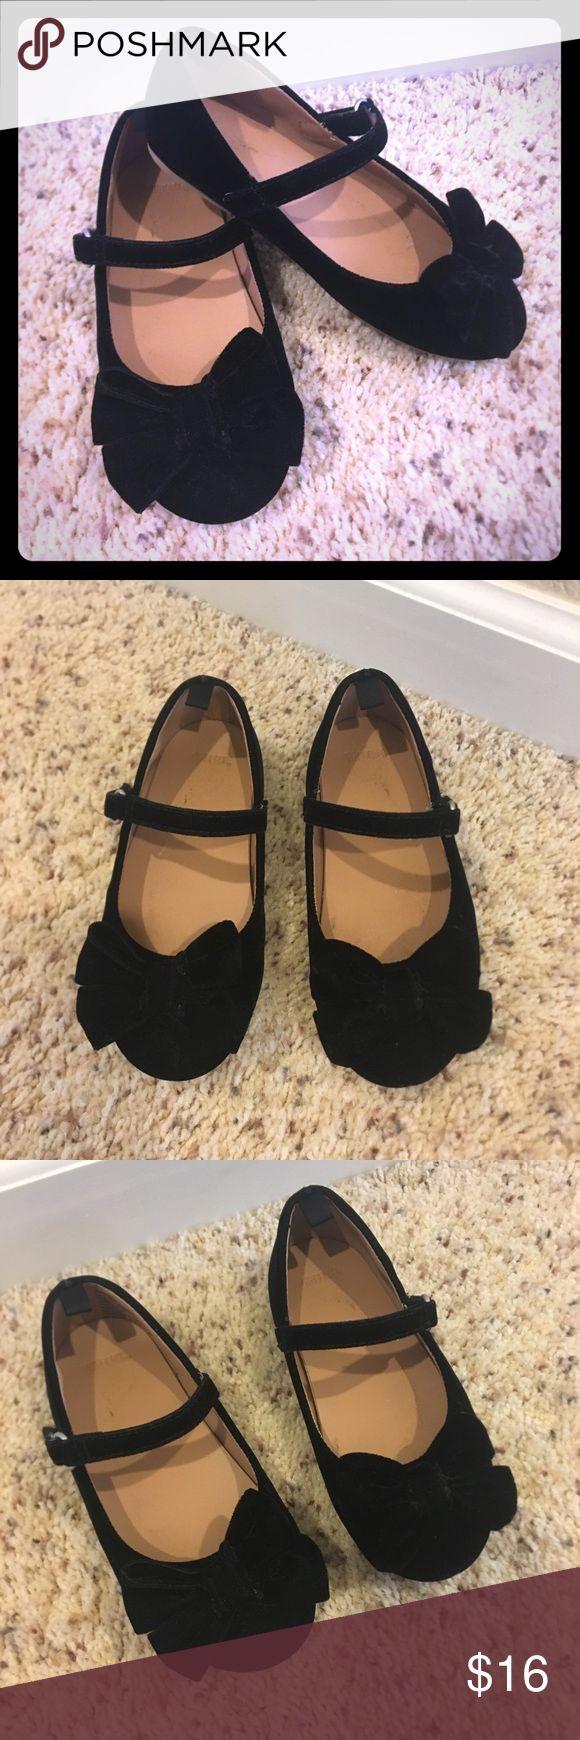 Gymboree Velvet Toddler Dress Shoes w/ Bows, Sz 9 Cutest toddler dress shoes!! Excellent condition! Bow detail at toe with Velcro closure. A classic shoe for your little girl! Gymboree Shoes Dress Shoes